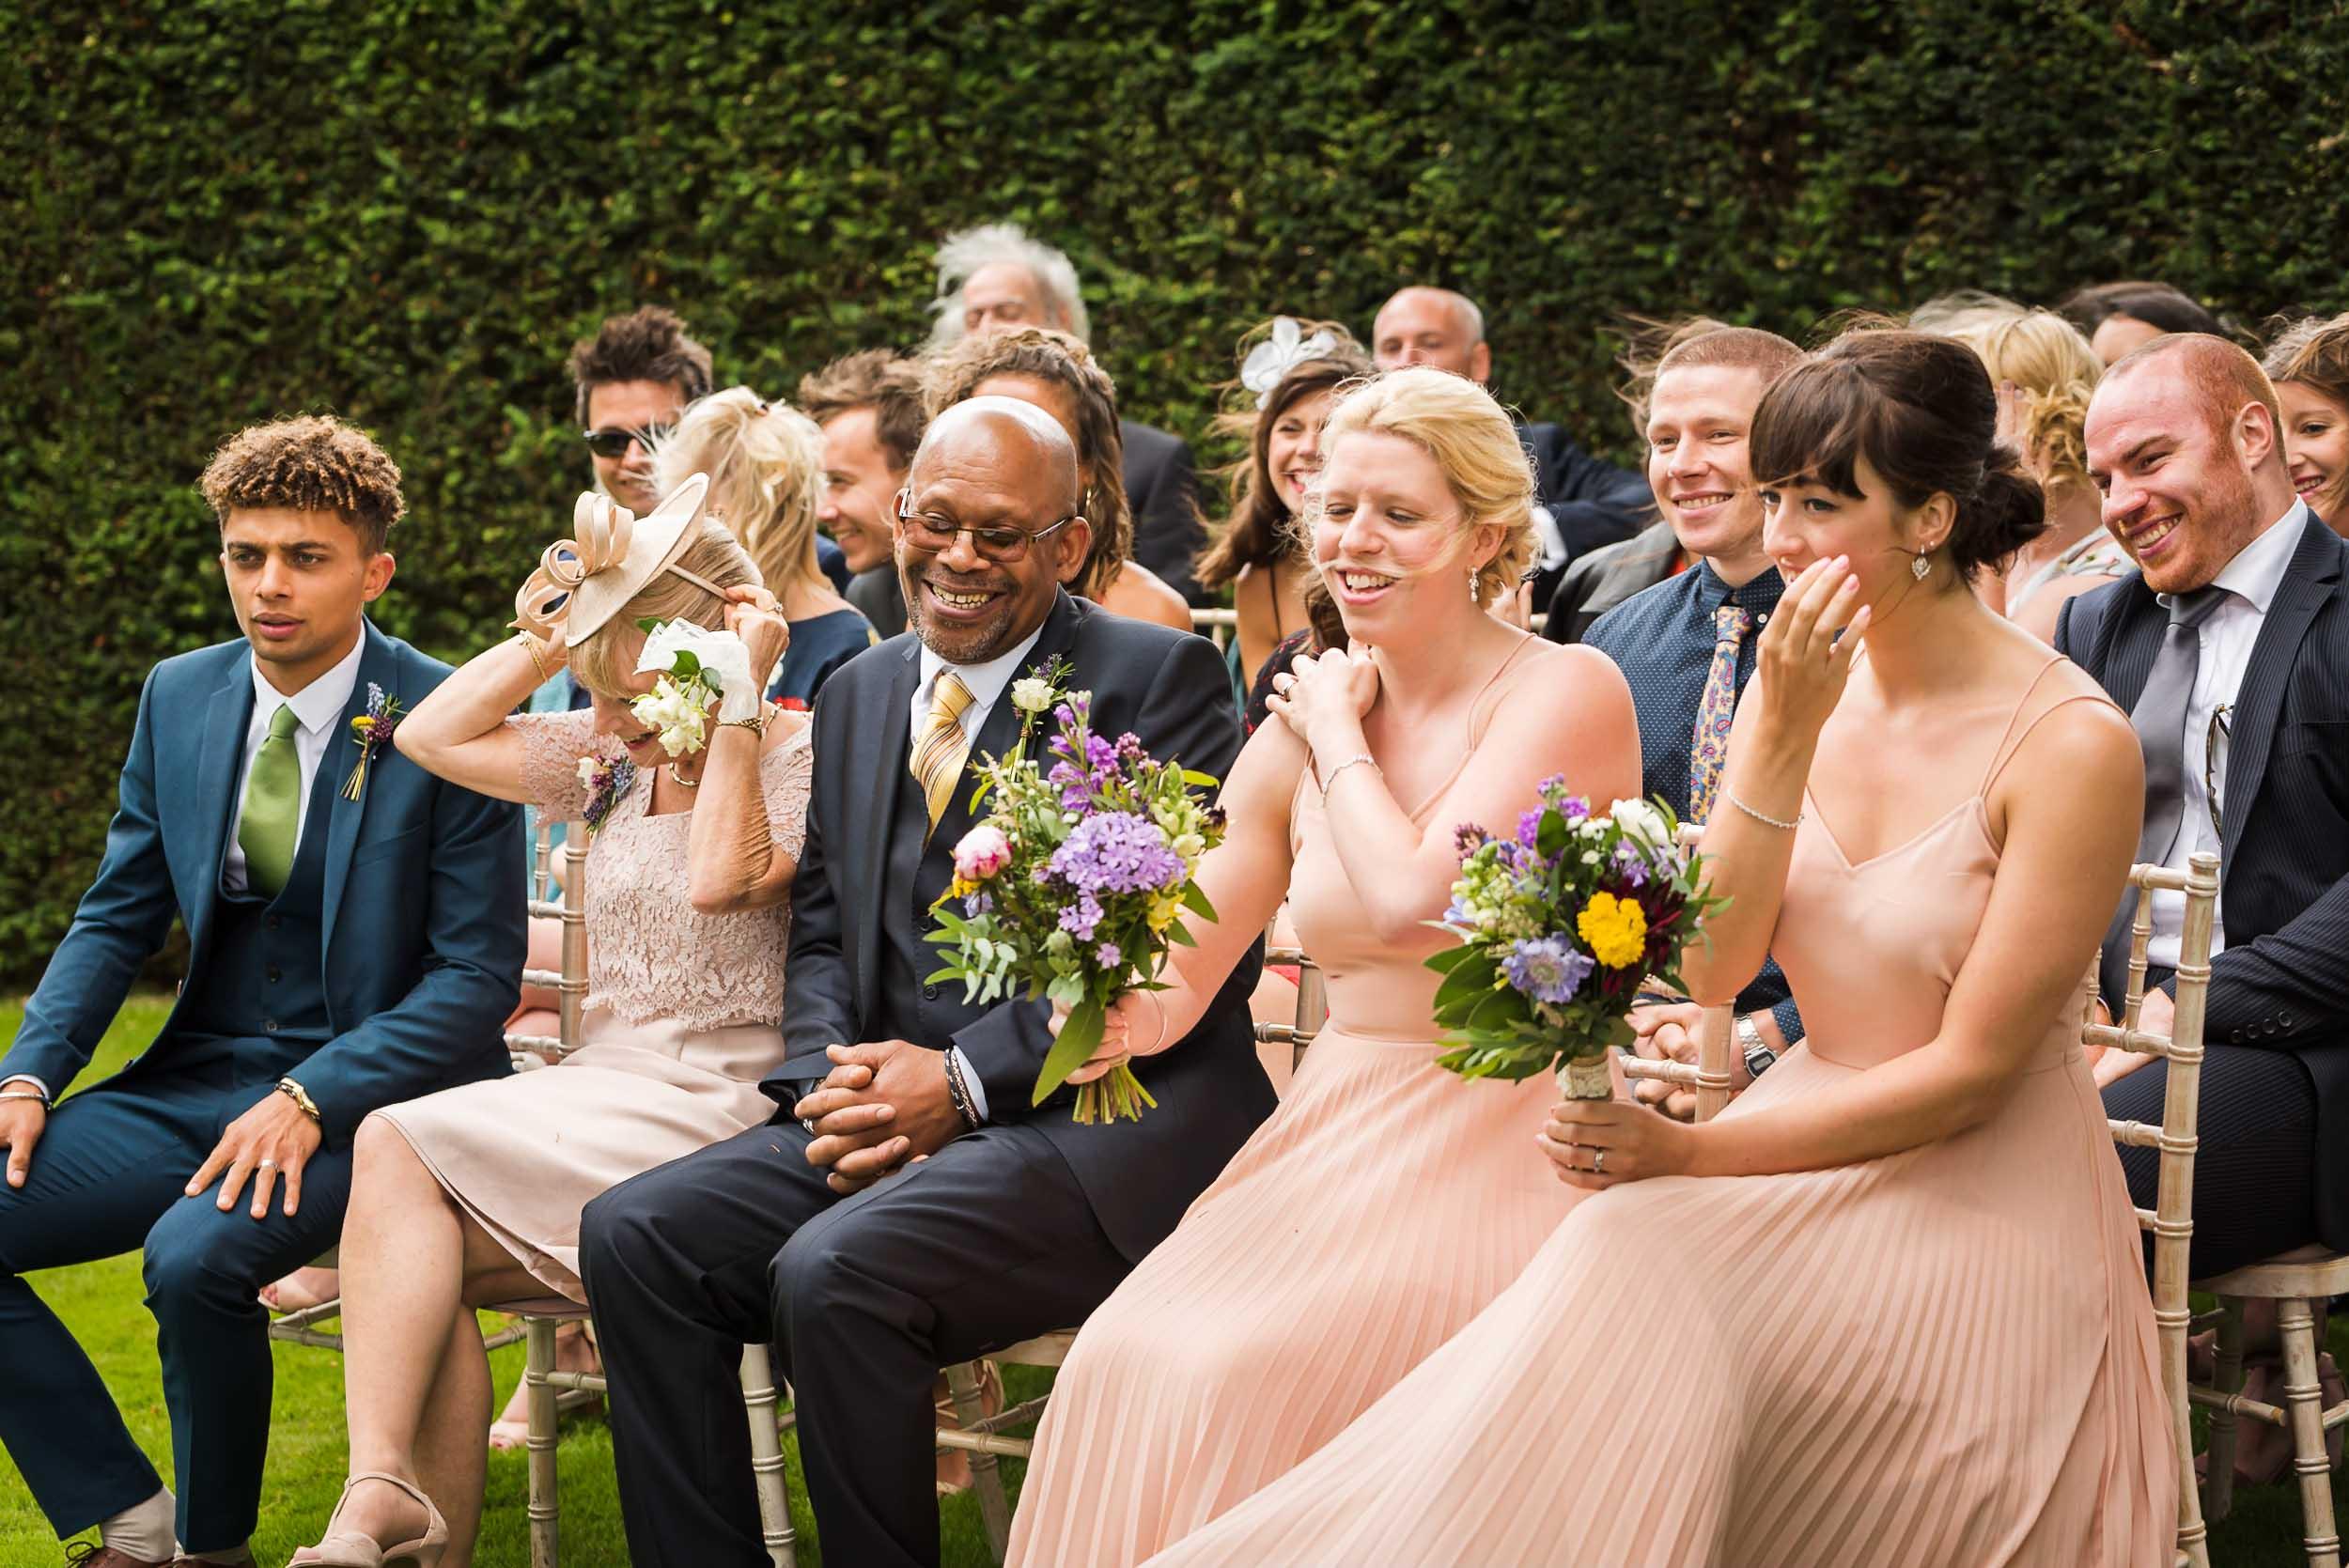 NC-20170805-2017-07-05_lara-and-nick-wedding-0374.jpg